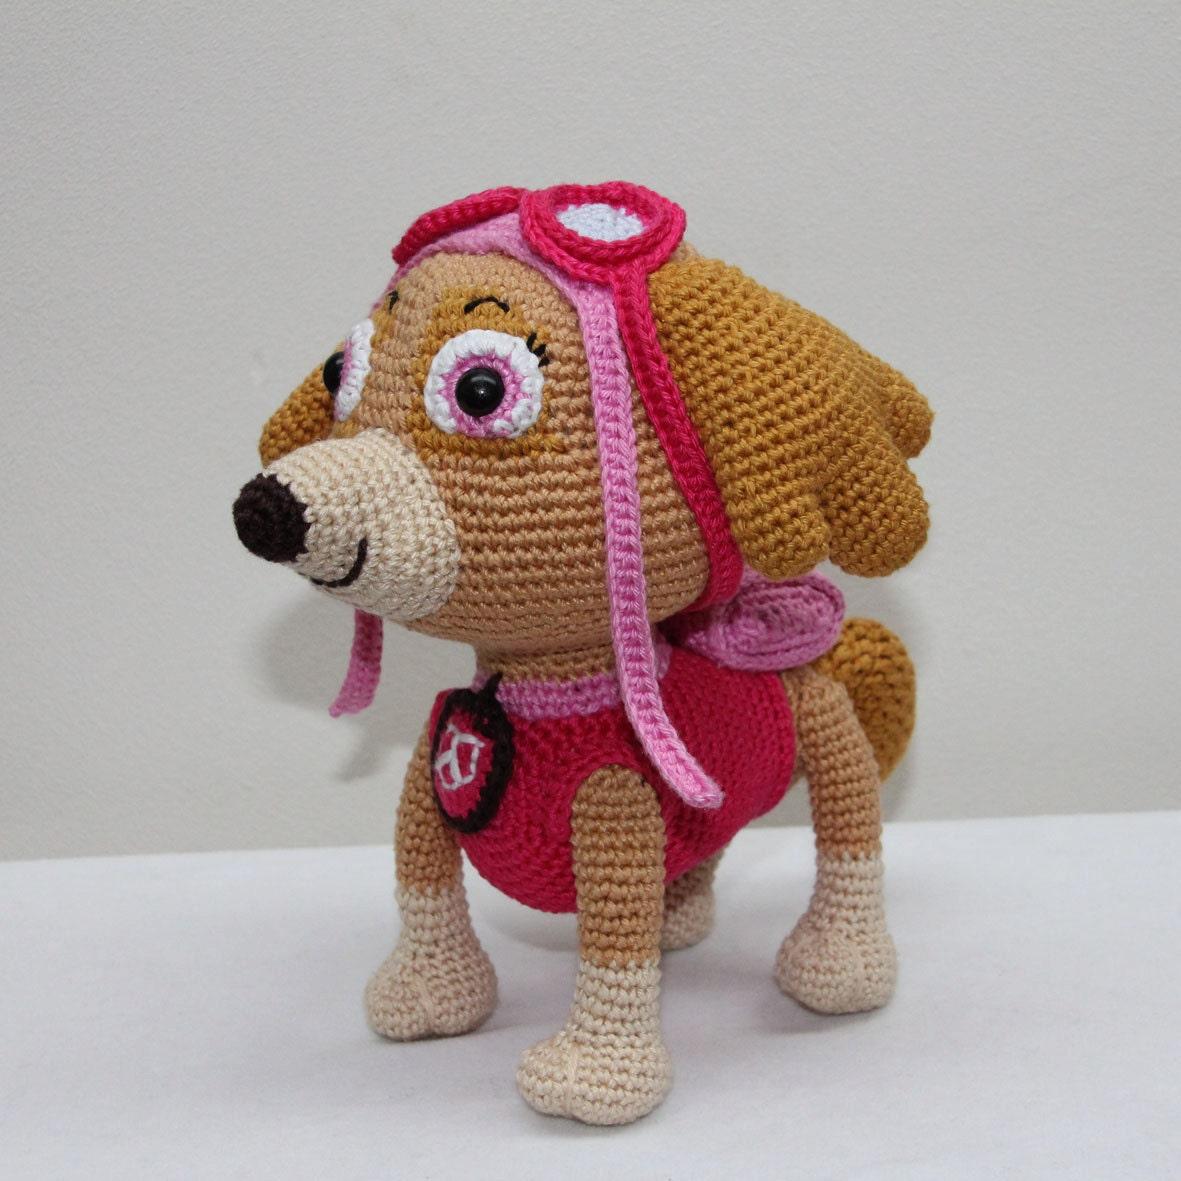 Amigurumi inspired by Skye Paw Patrol US/NL crochet pattern